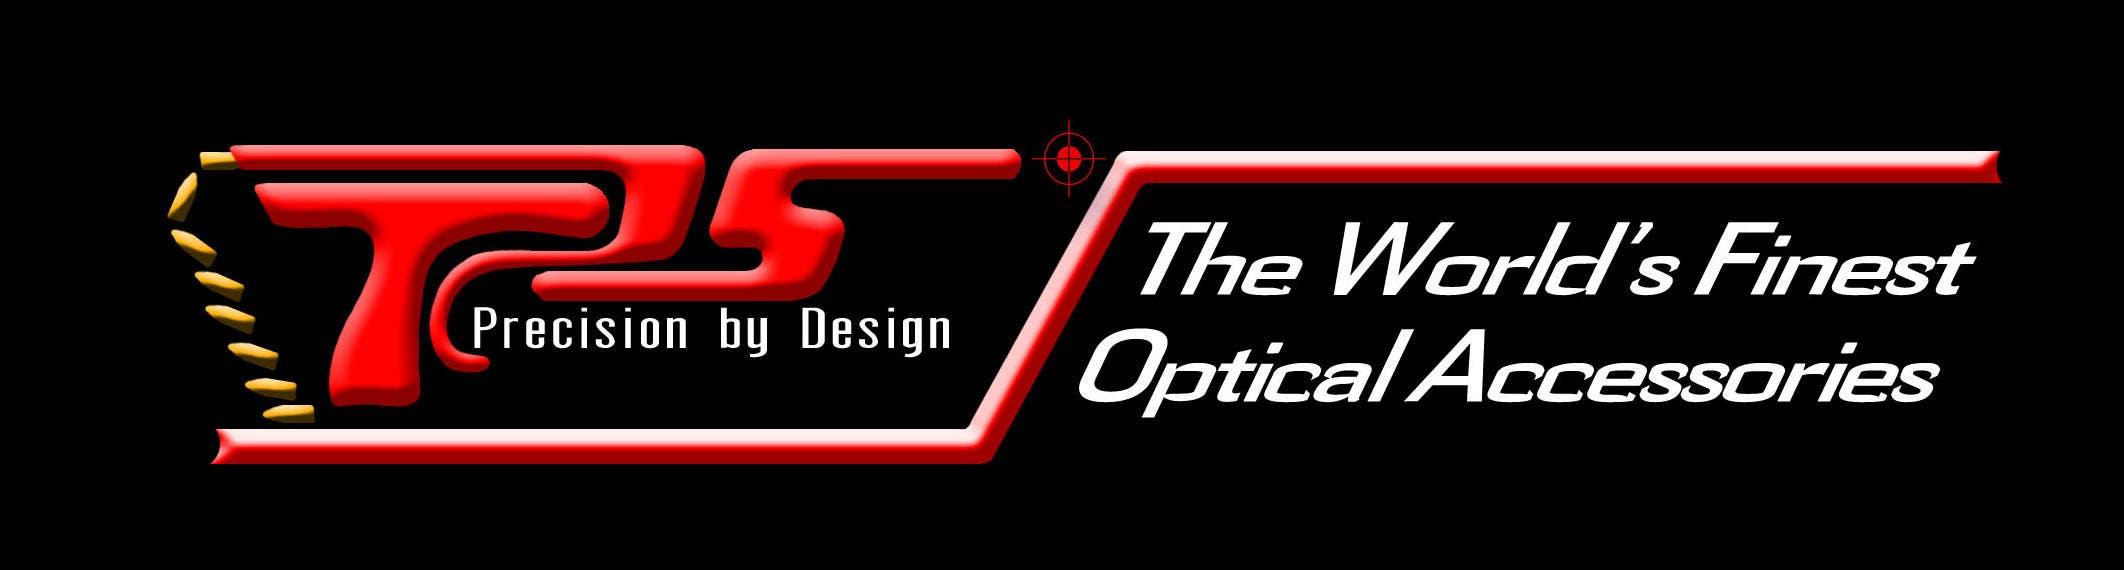 Konkurrenceindlæg #                                        32                                      for                                         Design a Logo for our Company Website